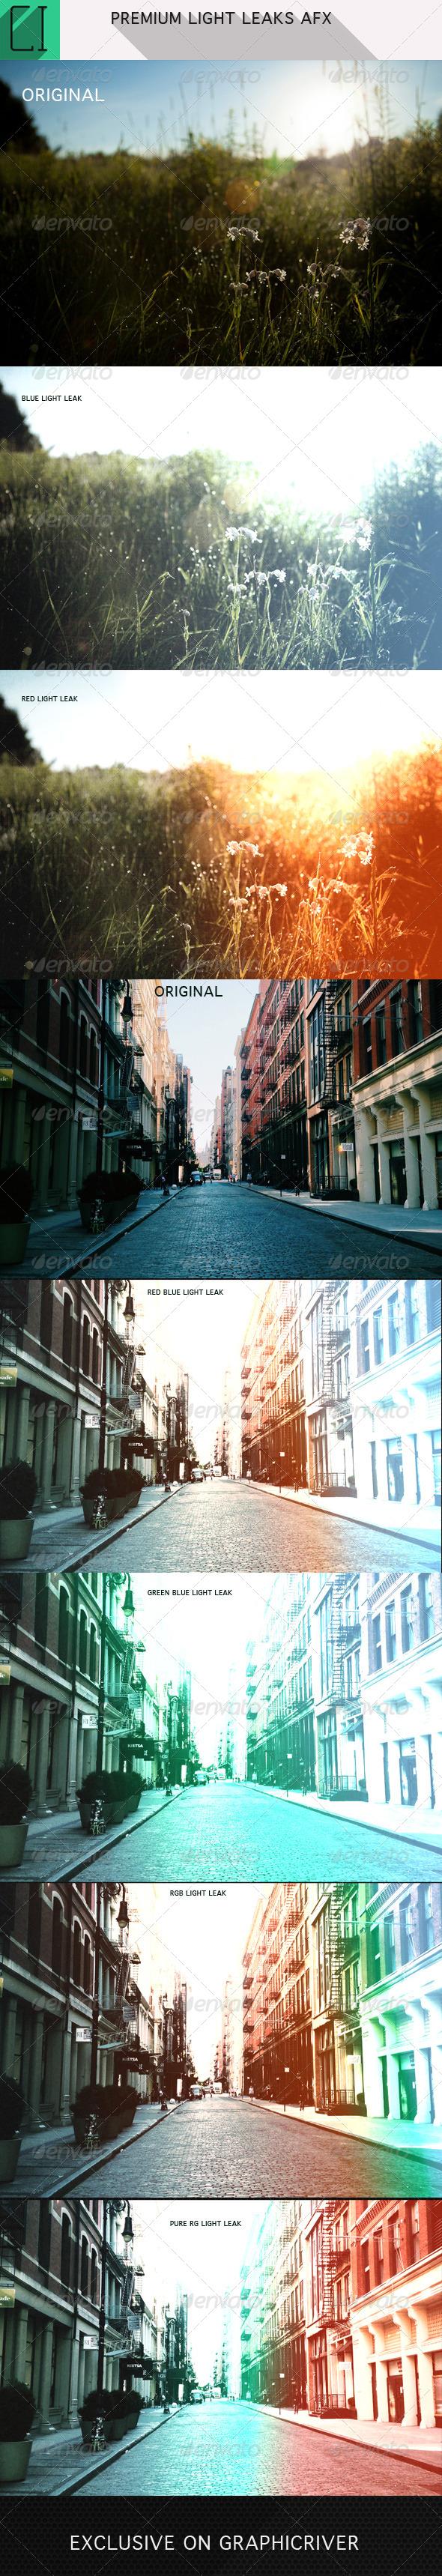 GraphicRiver Premium Light Leaks Photoshop AFX 5728100